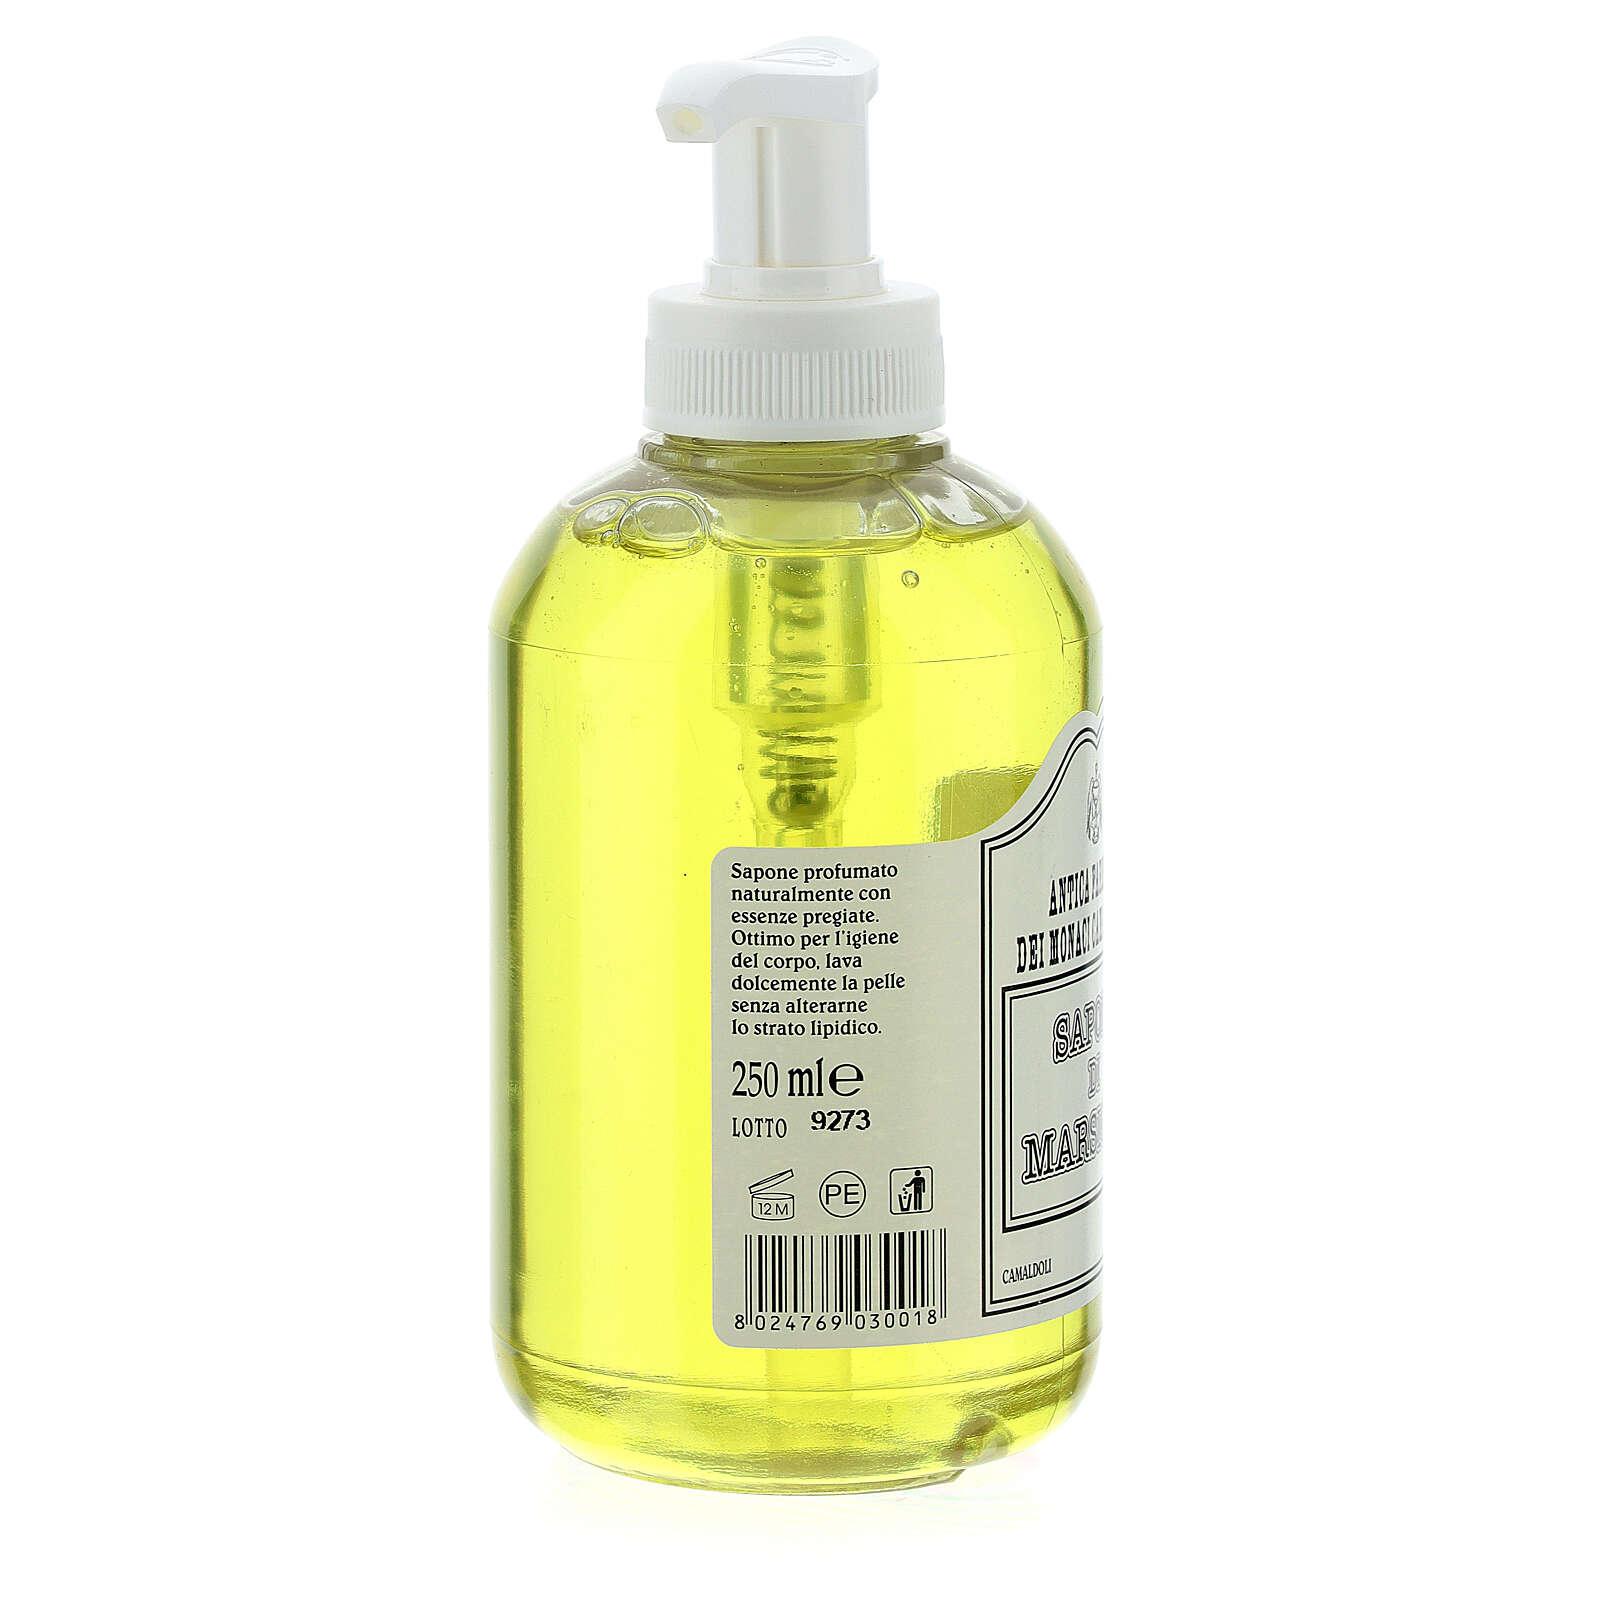 Savon liquide de Marseille 250 ml Camaldoli 4